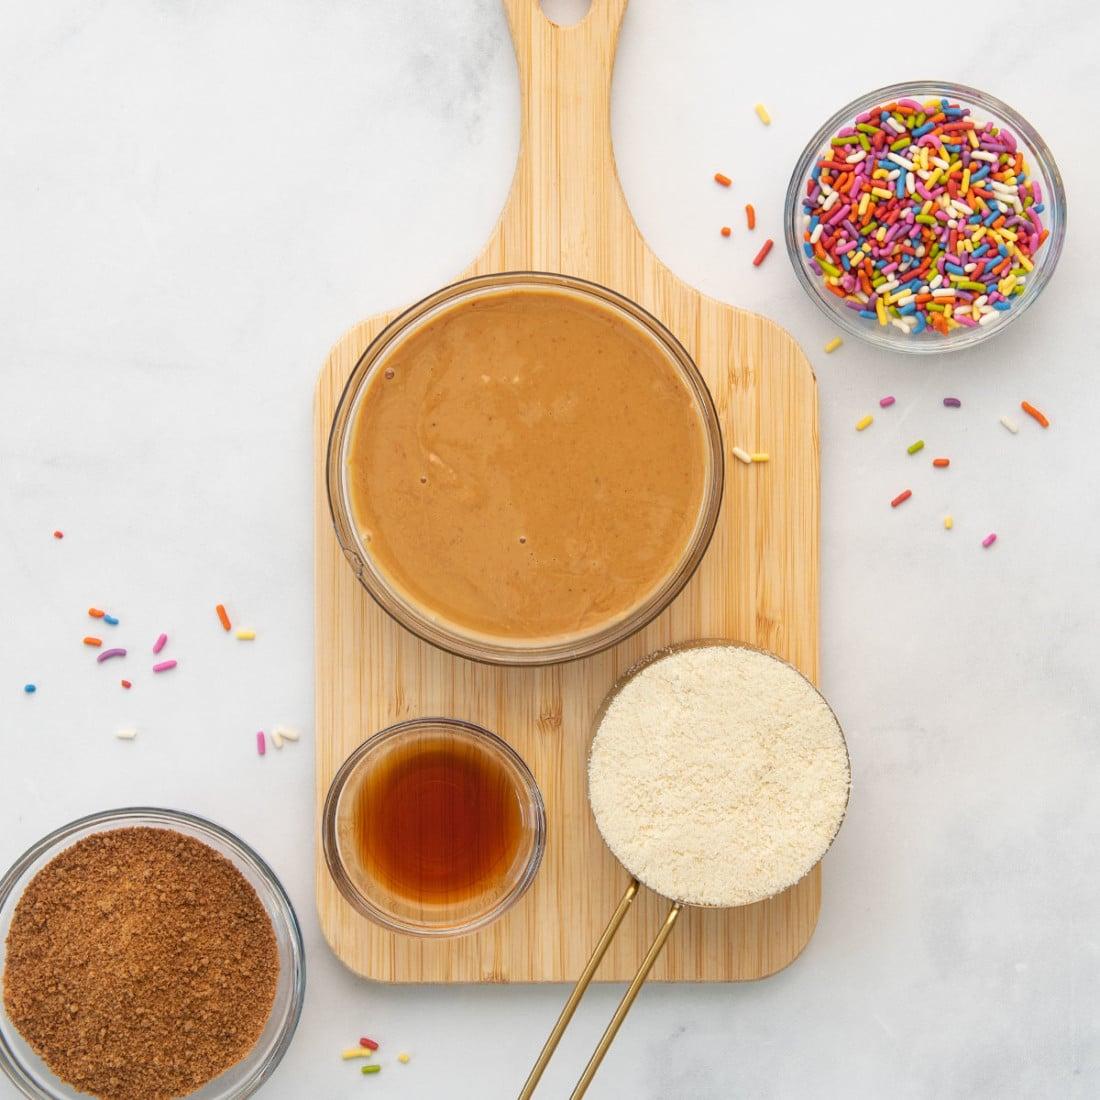 sprinkles, nut butter, almond flour, sugar on a board